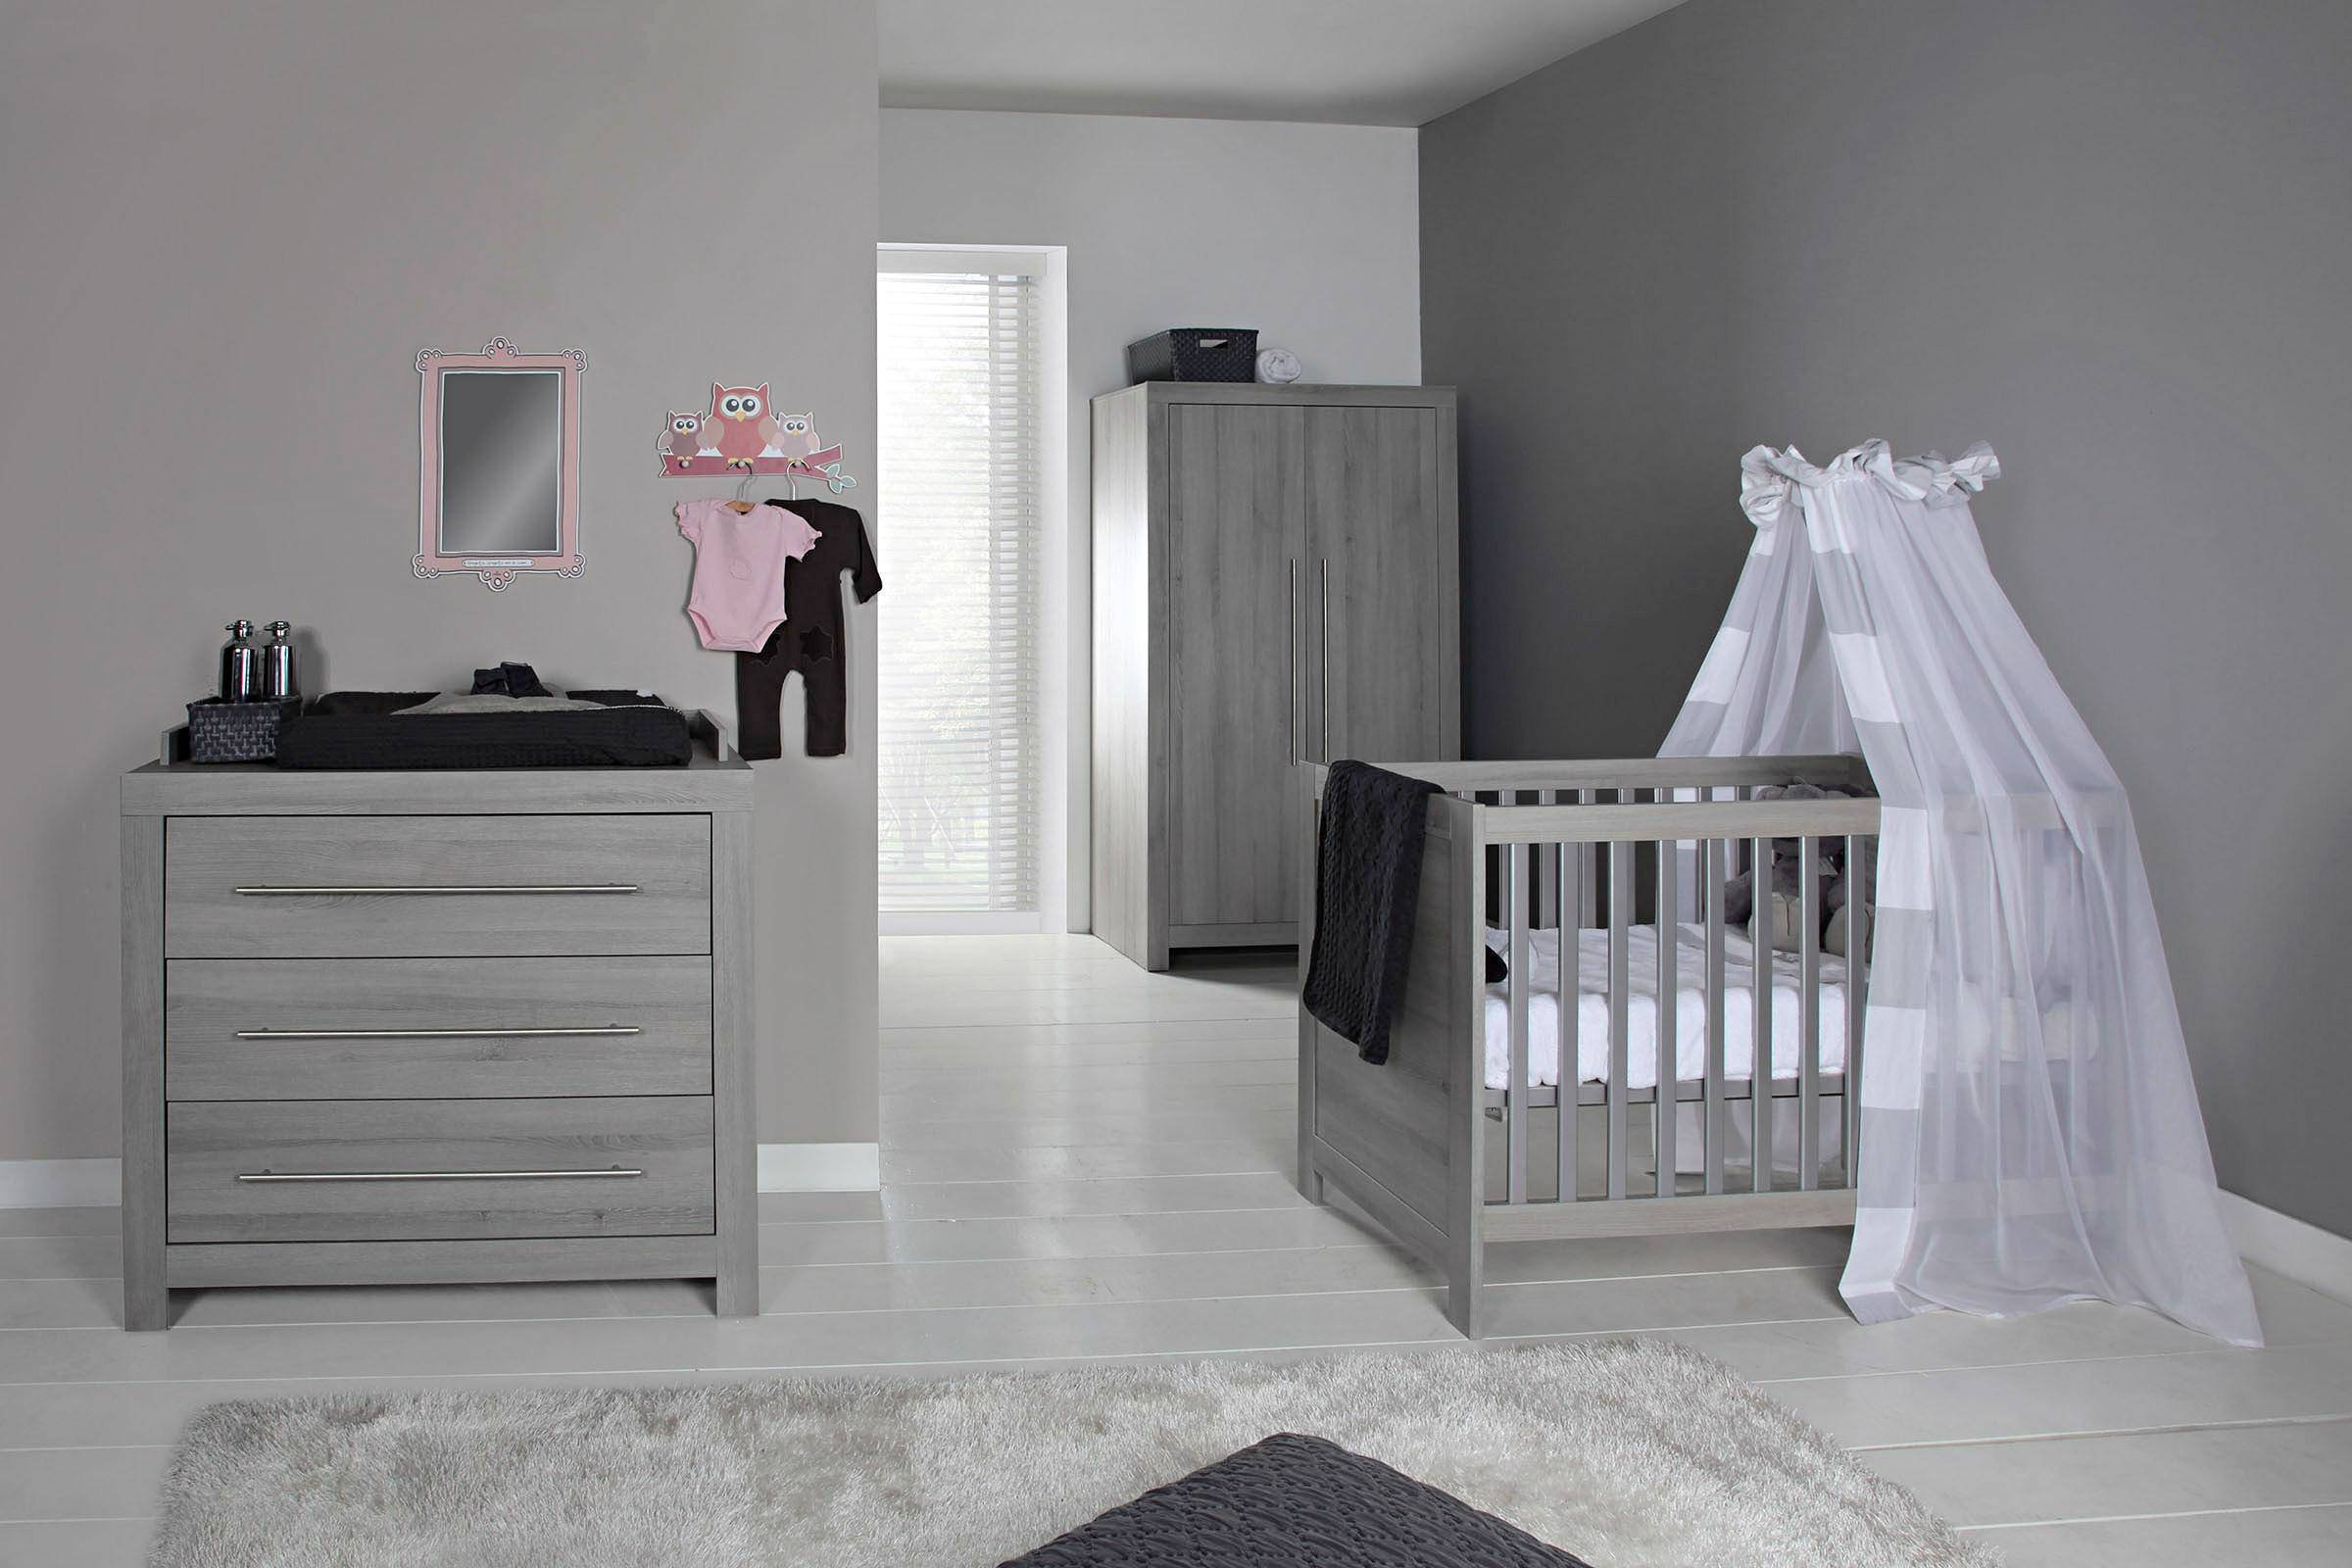 Europe Baby Vittoria babykamer (ledikant + commode) grijs